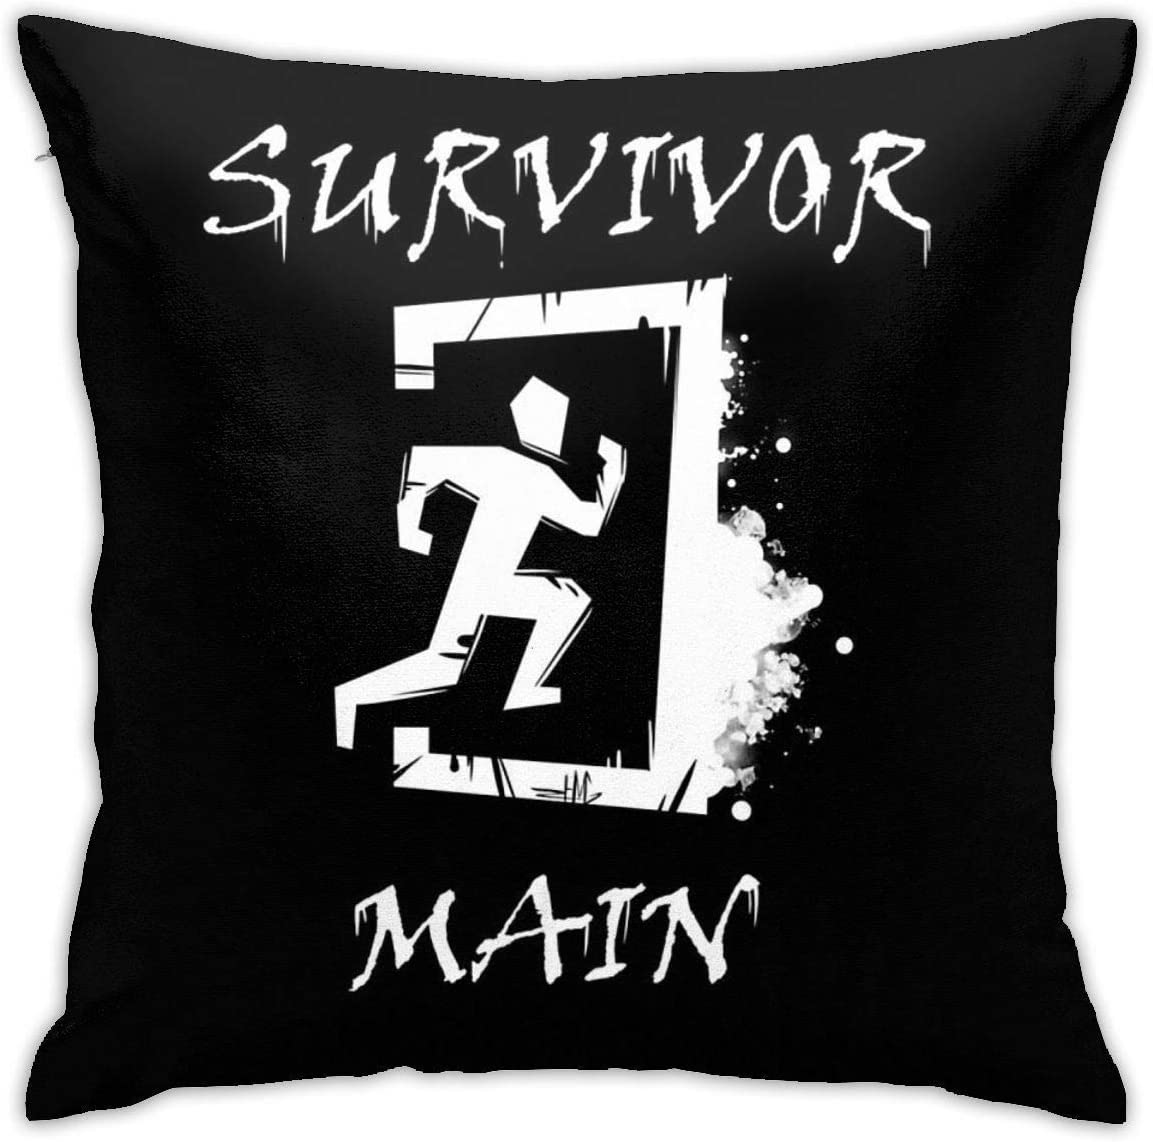 N/A Dbd Dead by Daylight Survivor Main Cushion Throw Pillow Cover Decorative Pillow Case For Sofa Bedroom 18 X 18 Inch: Amazon.es: Hogar